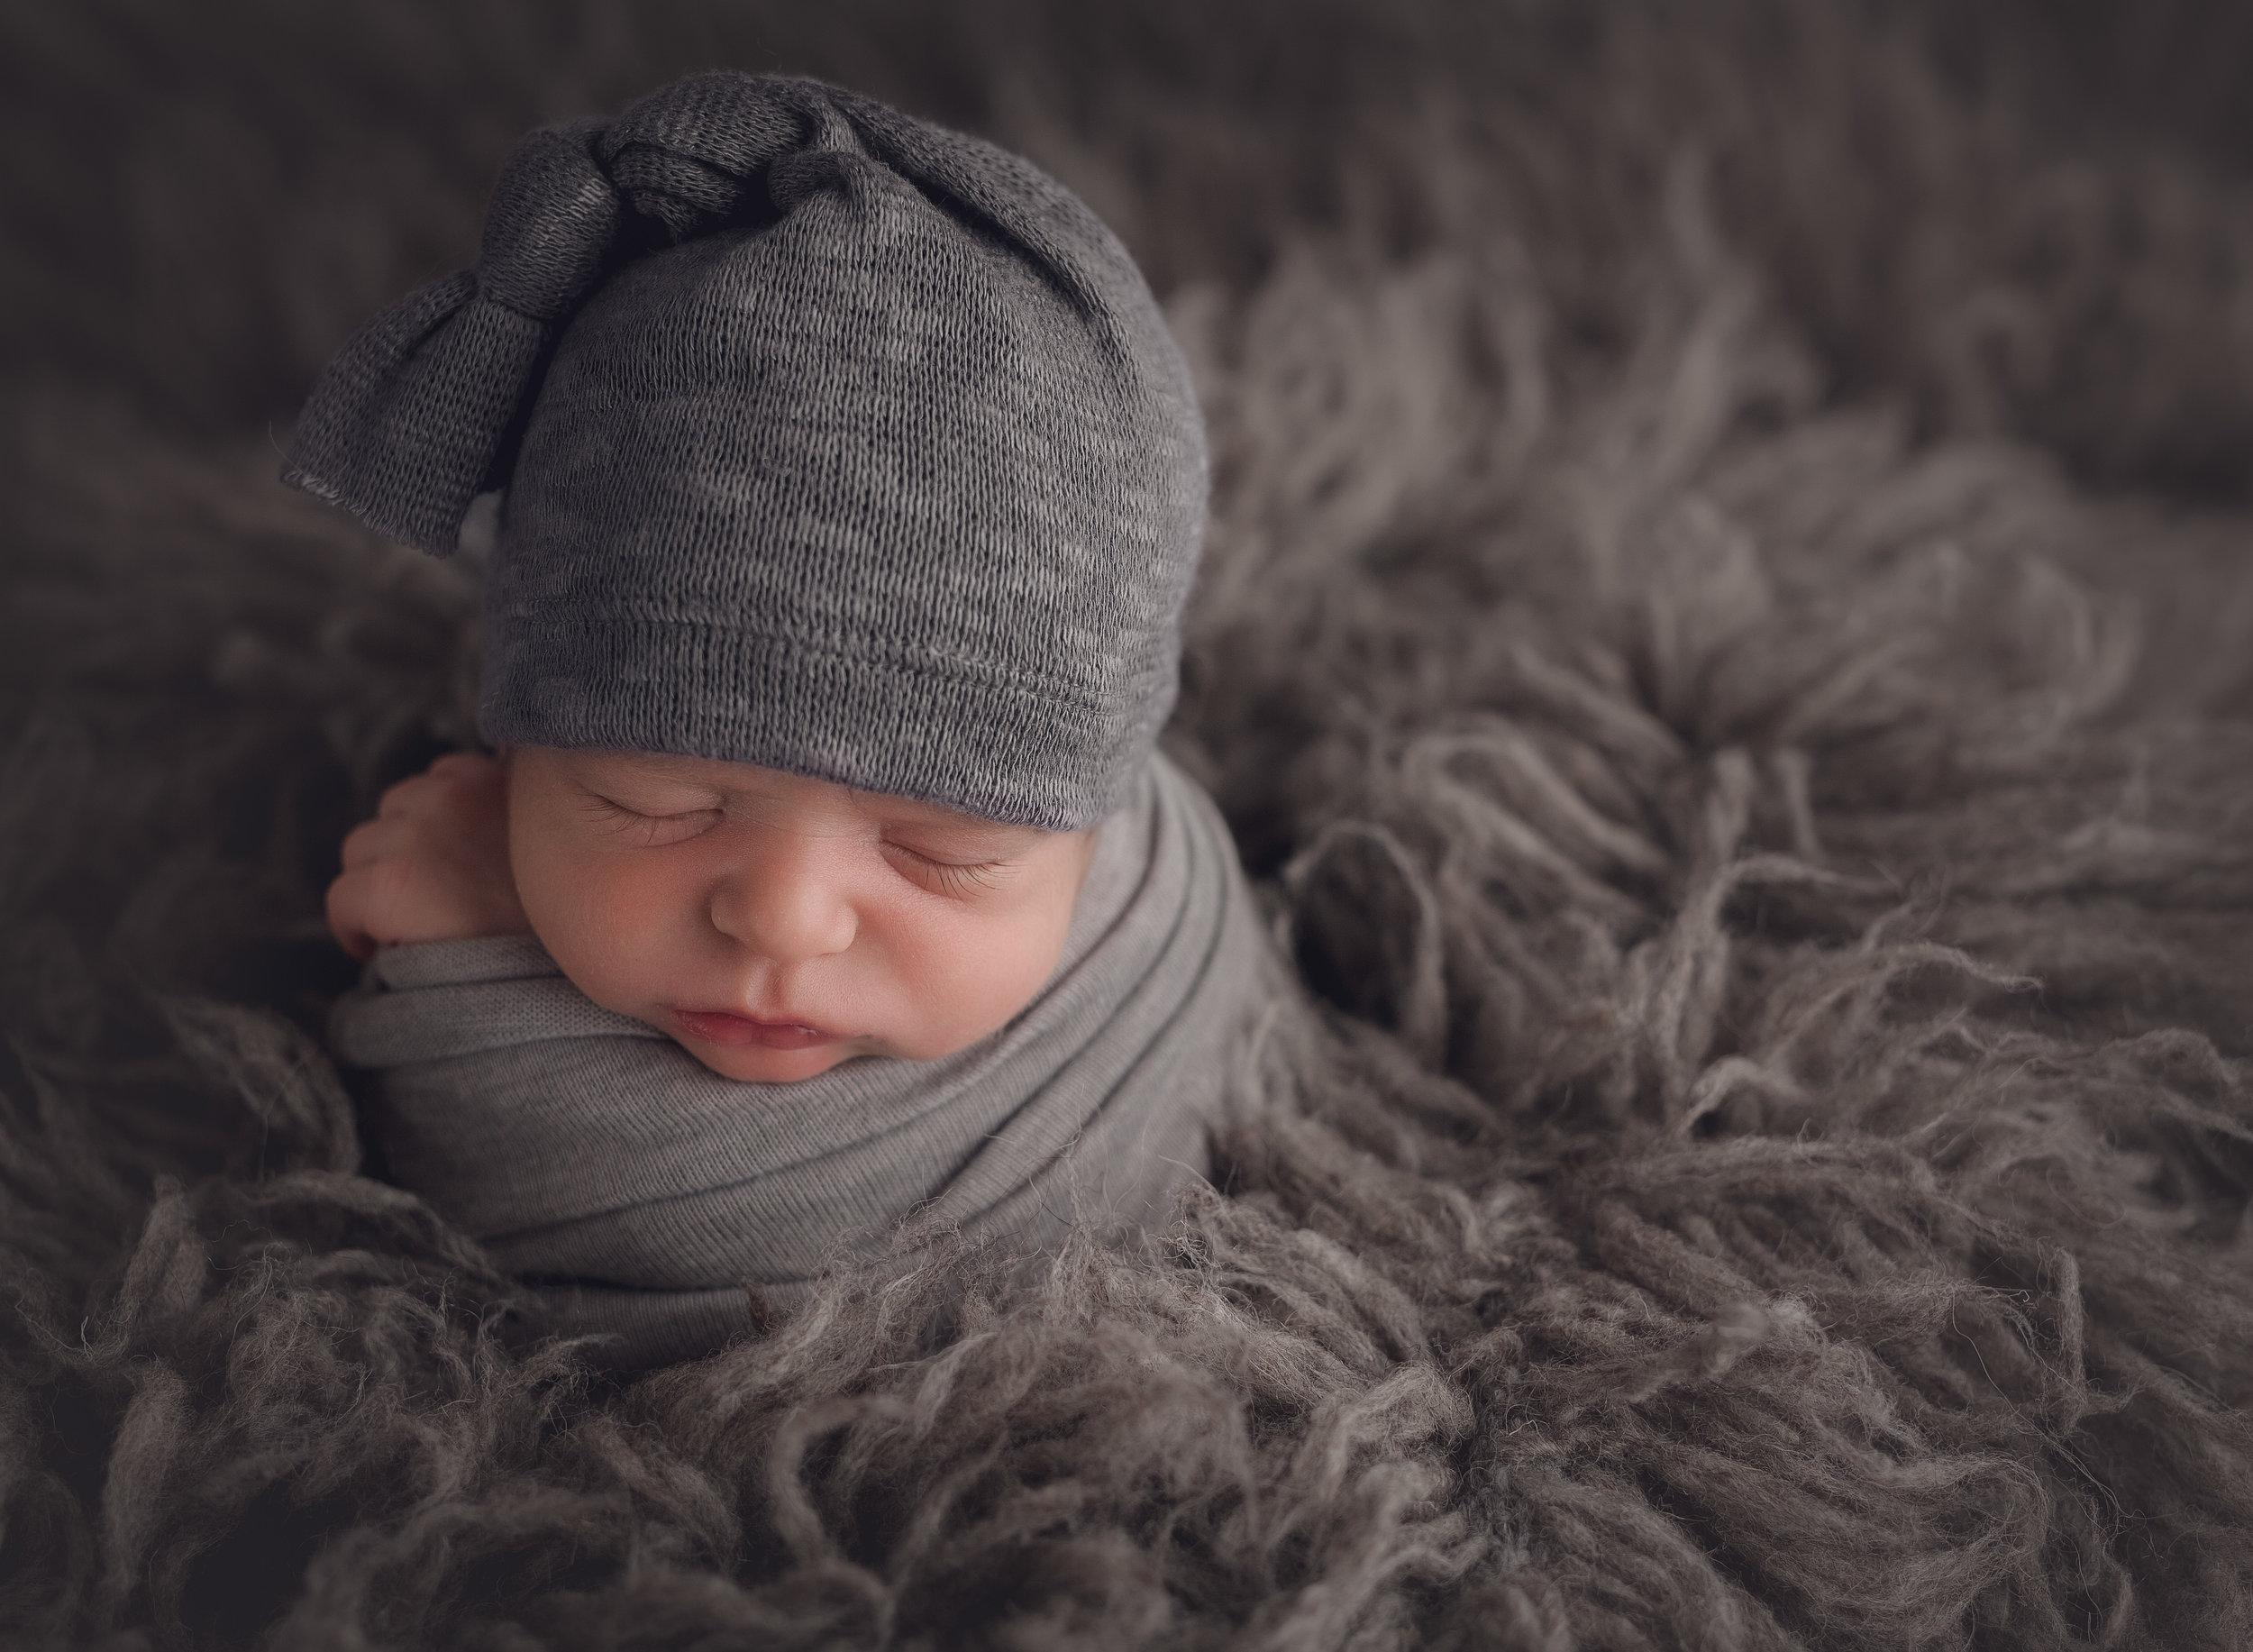 Northern New Jersey photographer- Hudson Valley- Children portrait photographer- Family photographer- Newborn photographer- fresh 48- posed- props- Bergen county- morris county- Ringwood, kinnelon, Oakland